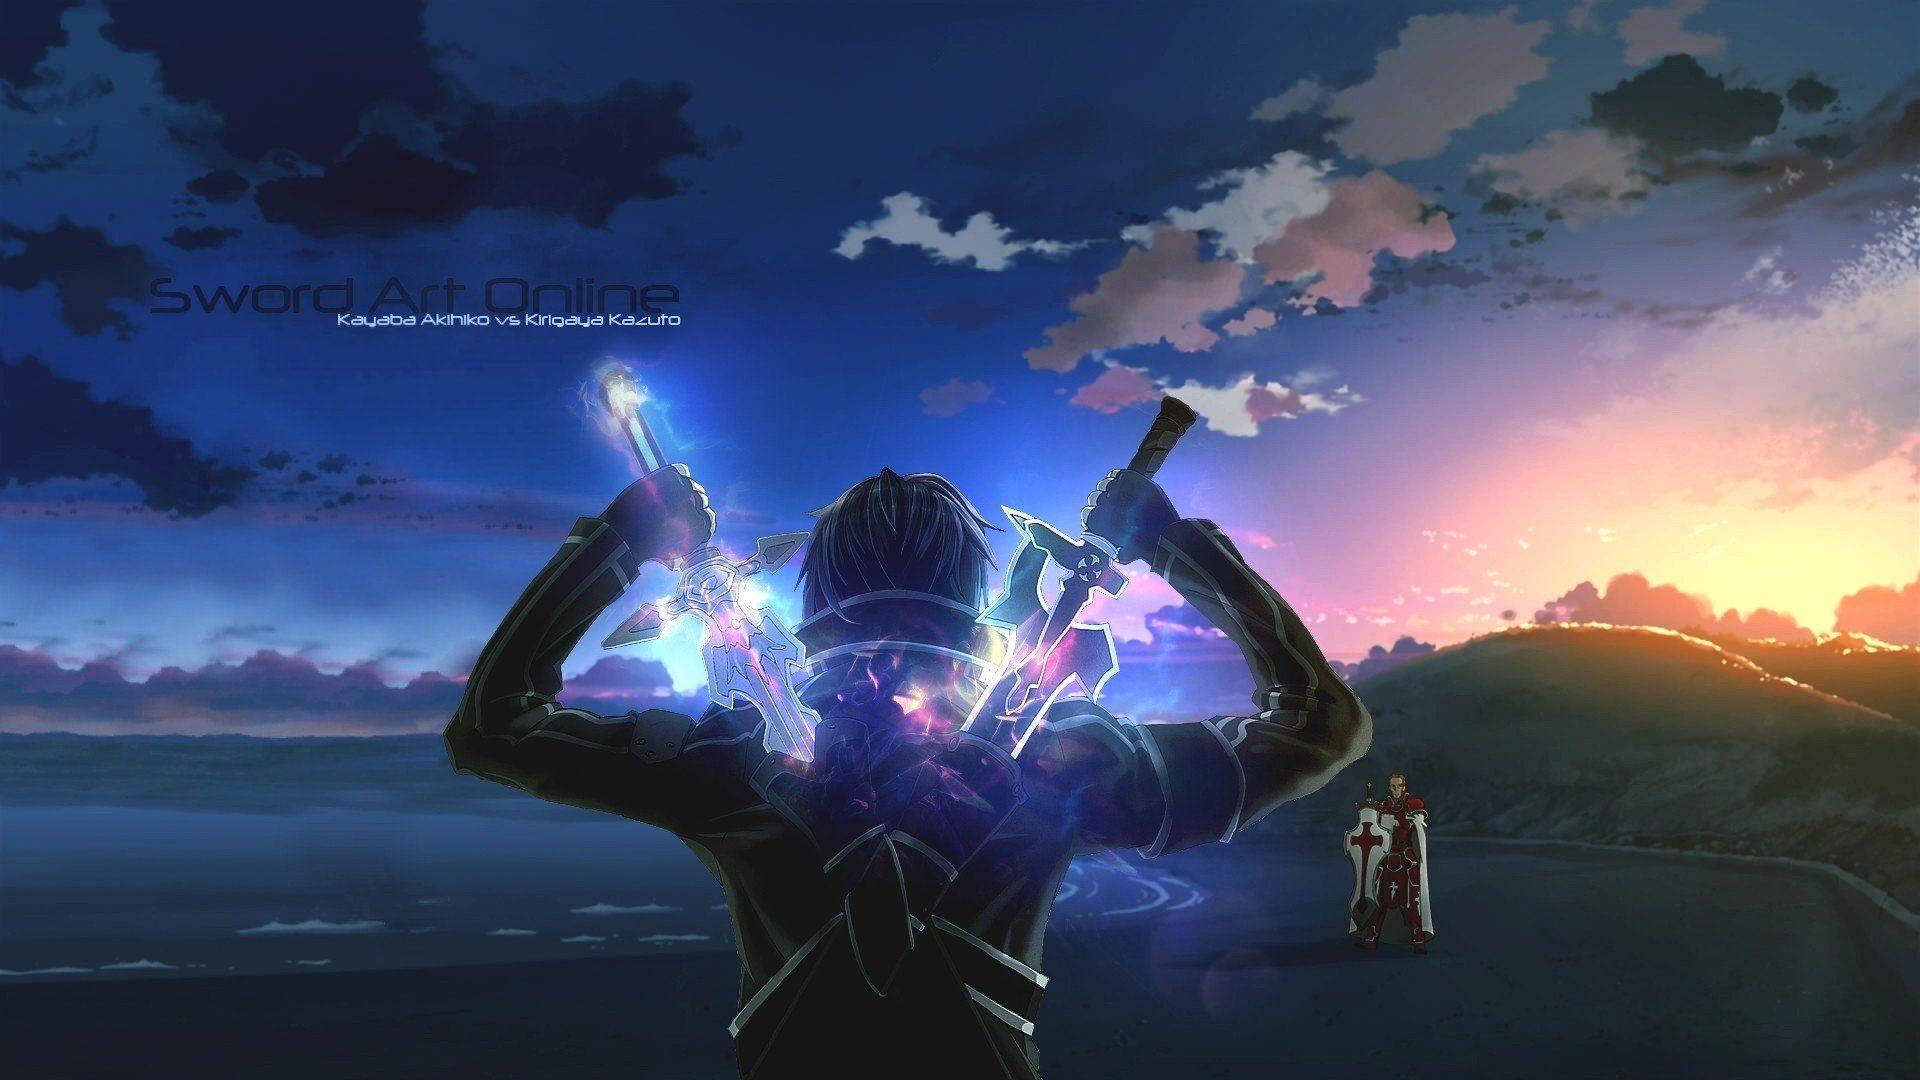 Anime Sword Art Online Anime Kirito (Sword Art Online) Kayaba Akihiko Epée Weapon Lever De ...